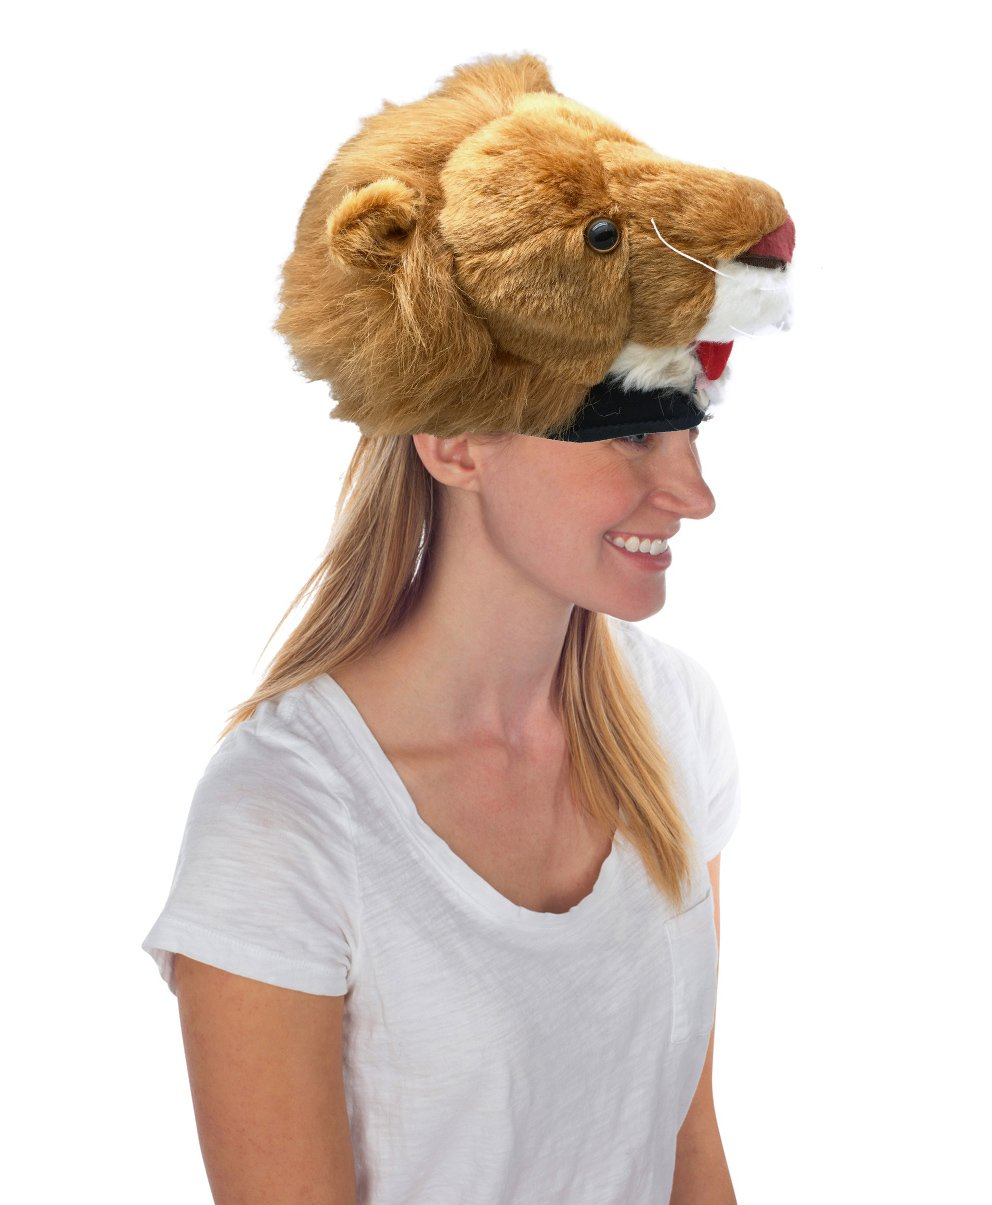 Furry Lion Animal Hat, Realistic Plush Costume Headwear, 1 Size